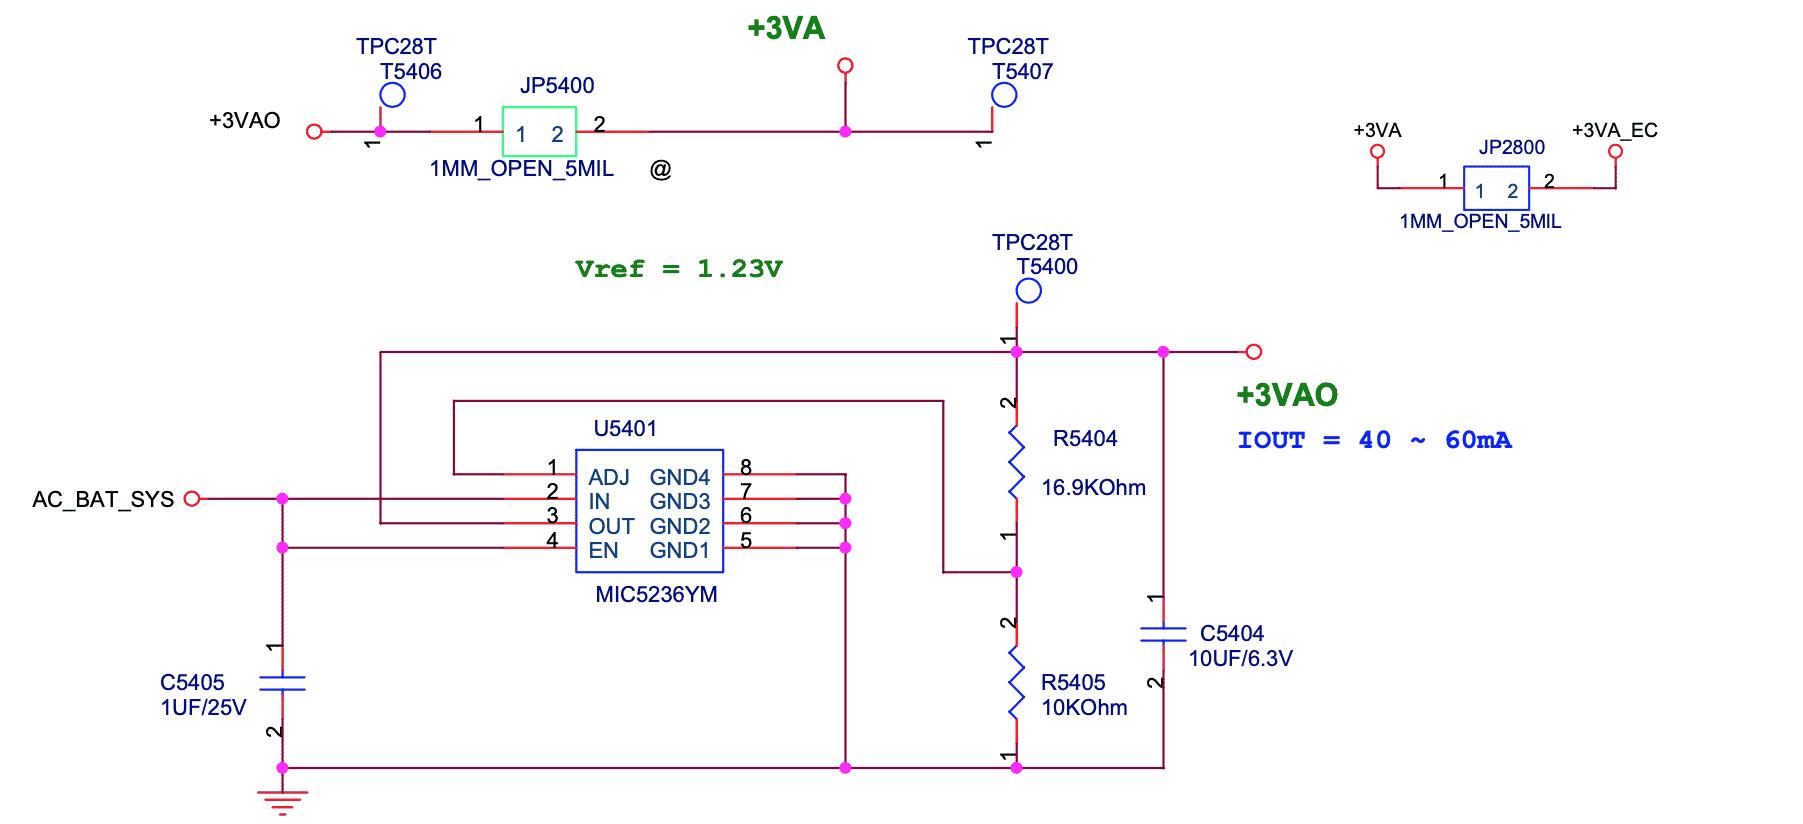 схема линейного стабилизатора MIC5236YM